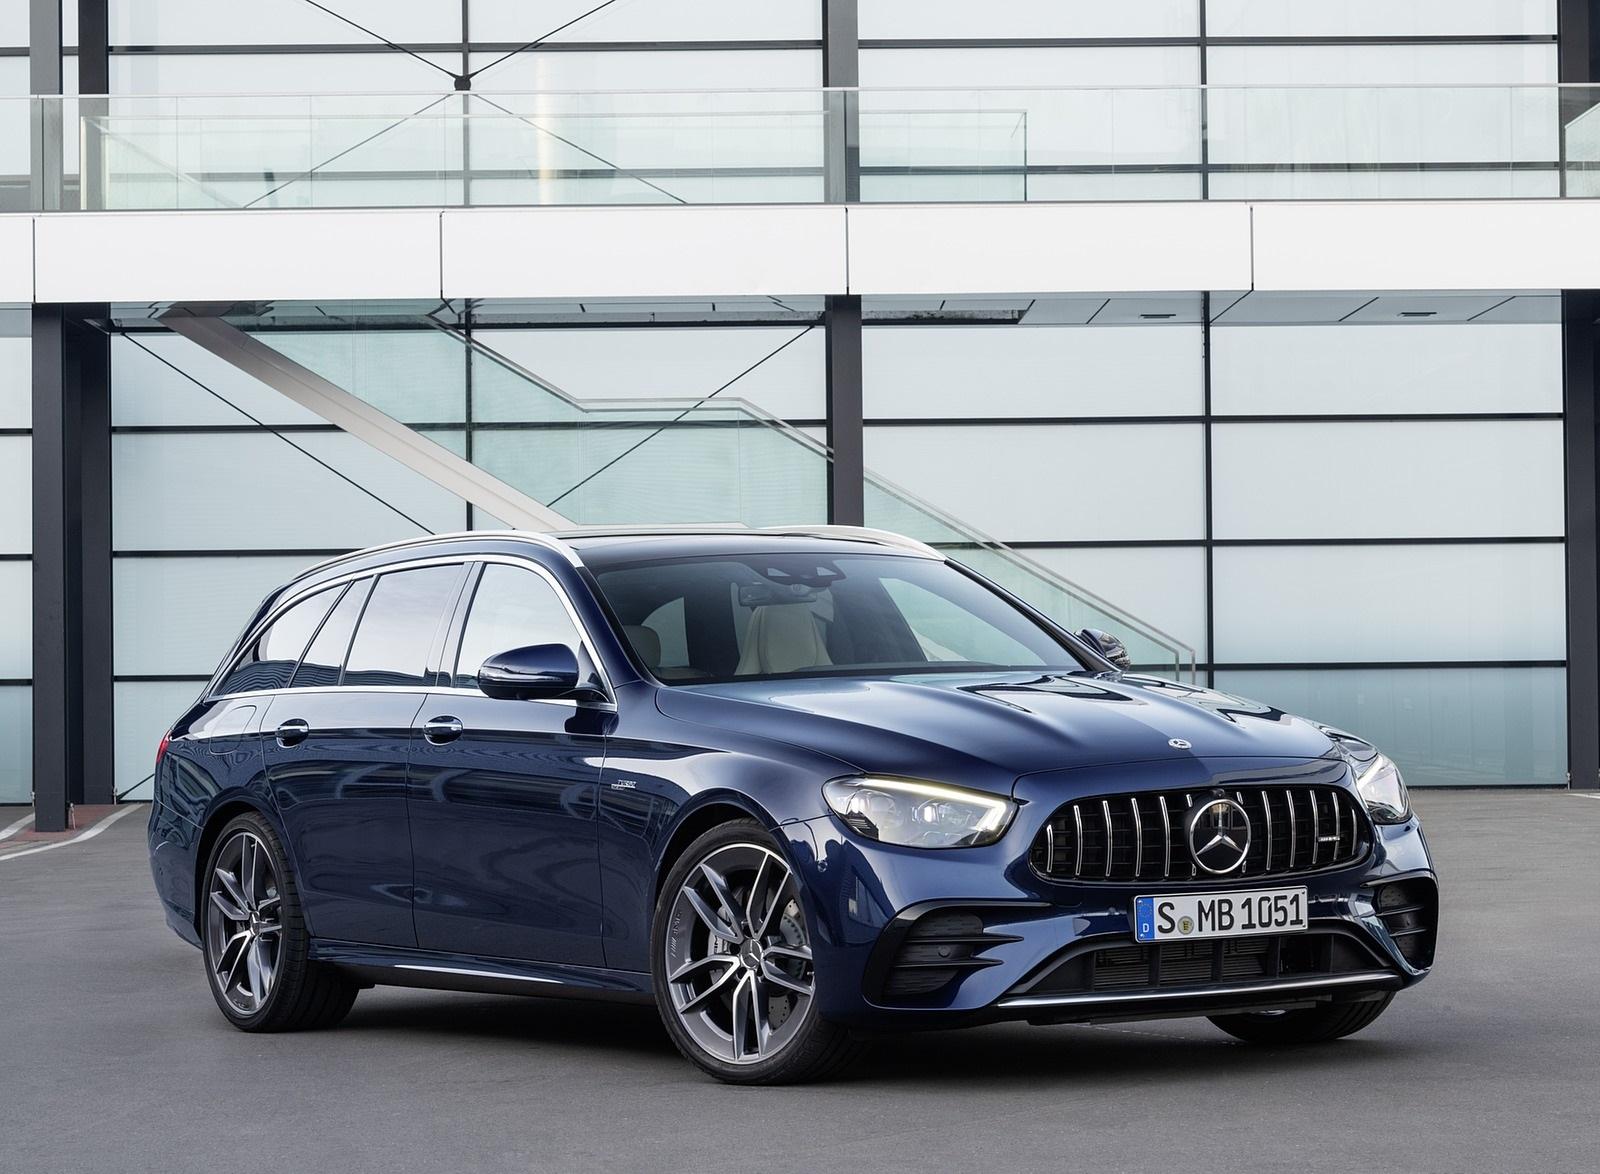 2021 Mercedes-AMG E 53 Estate 4MATIC+ T-Model (Color: Cavansite Blue Metallic) Front Three-Quarter Wallpapers (7)